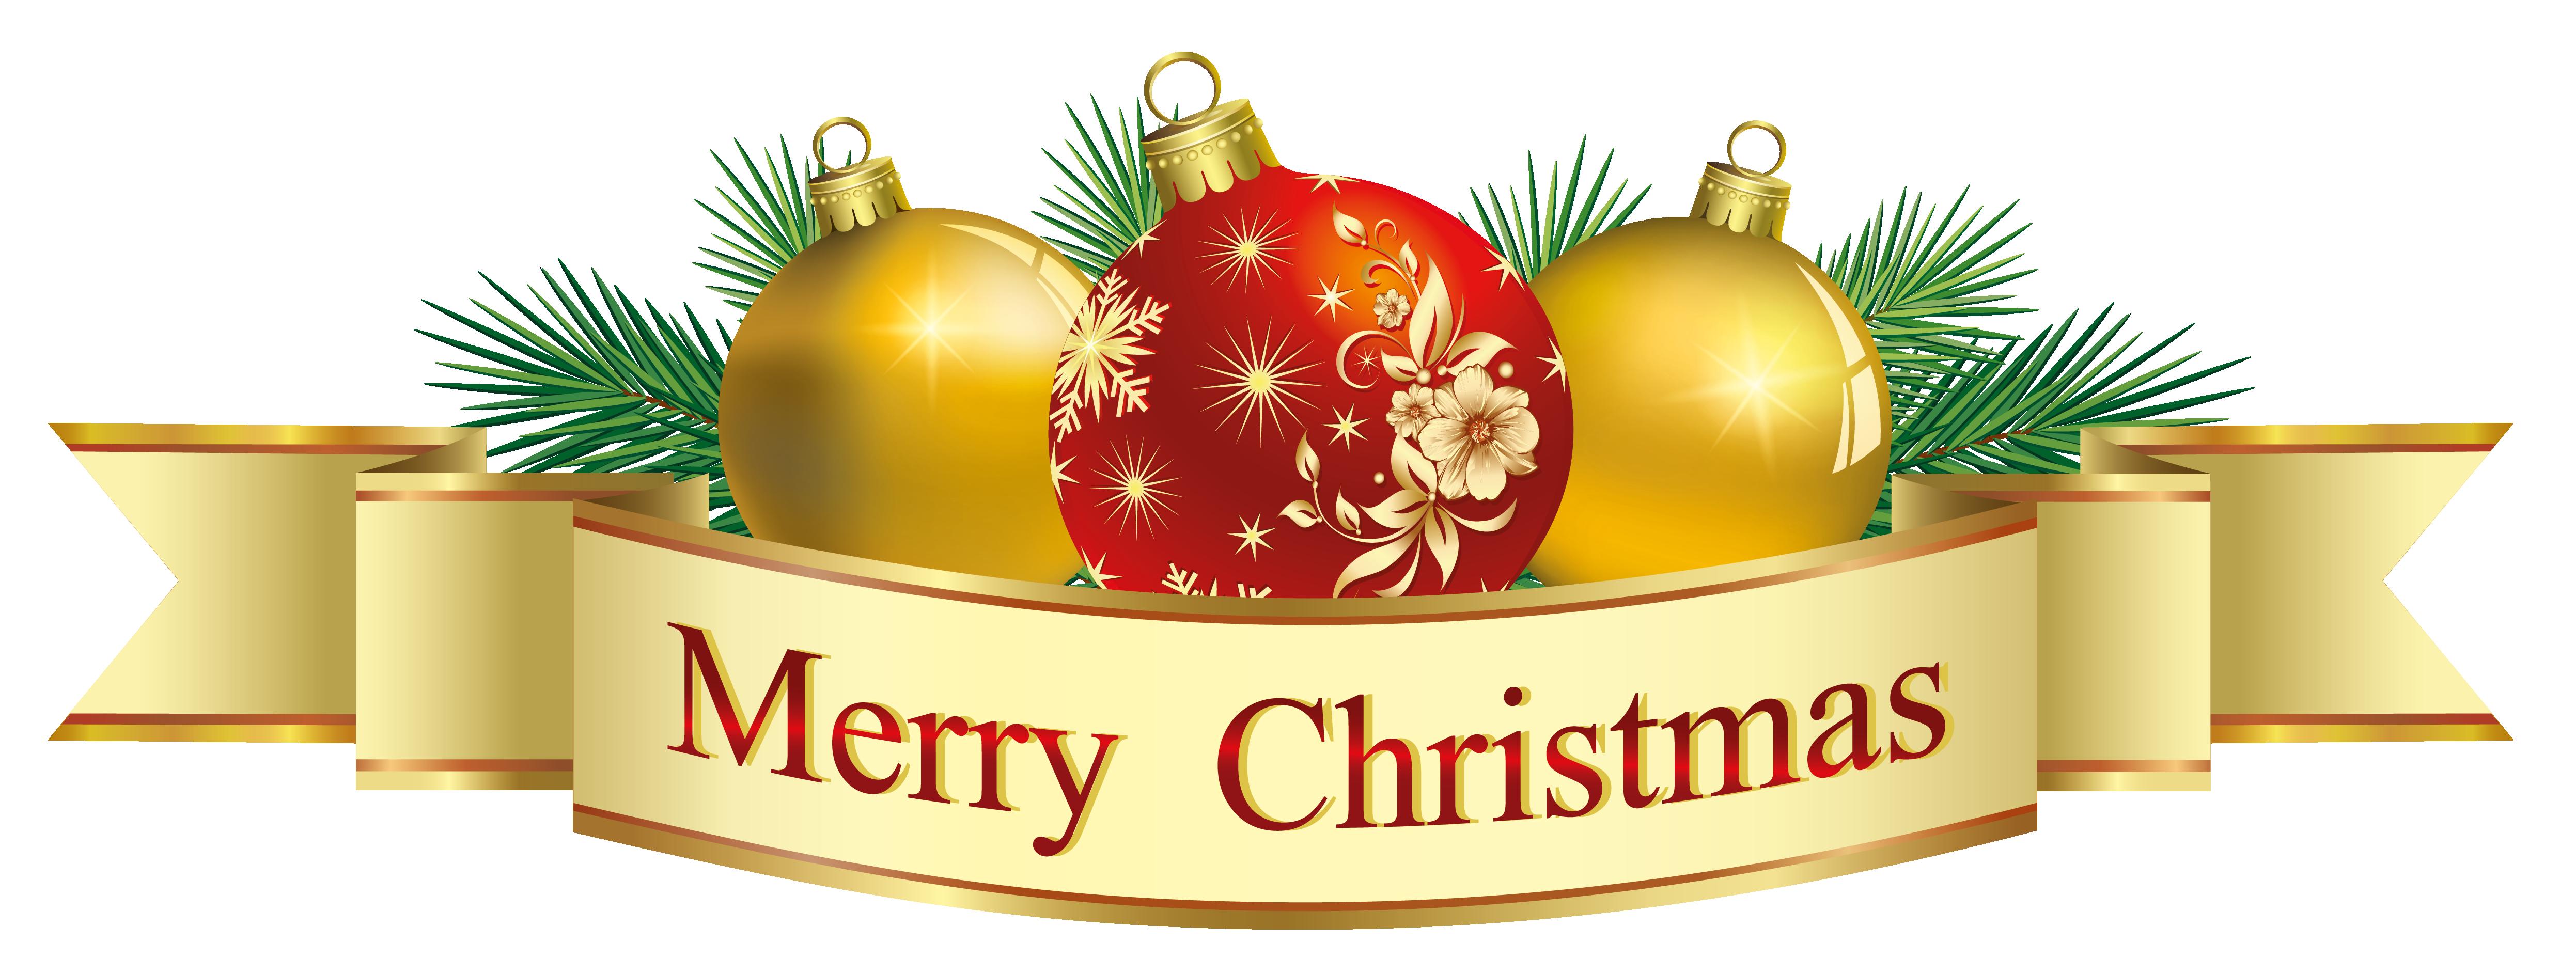 Merry Christmas Clip Art ..-Merry Christmas Clip Art ..-6